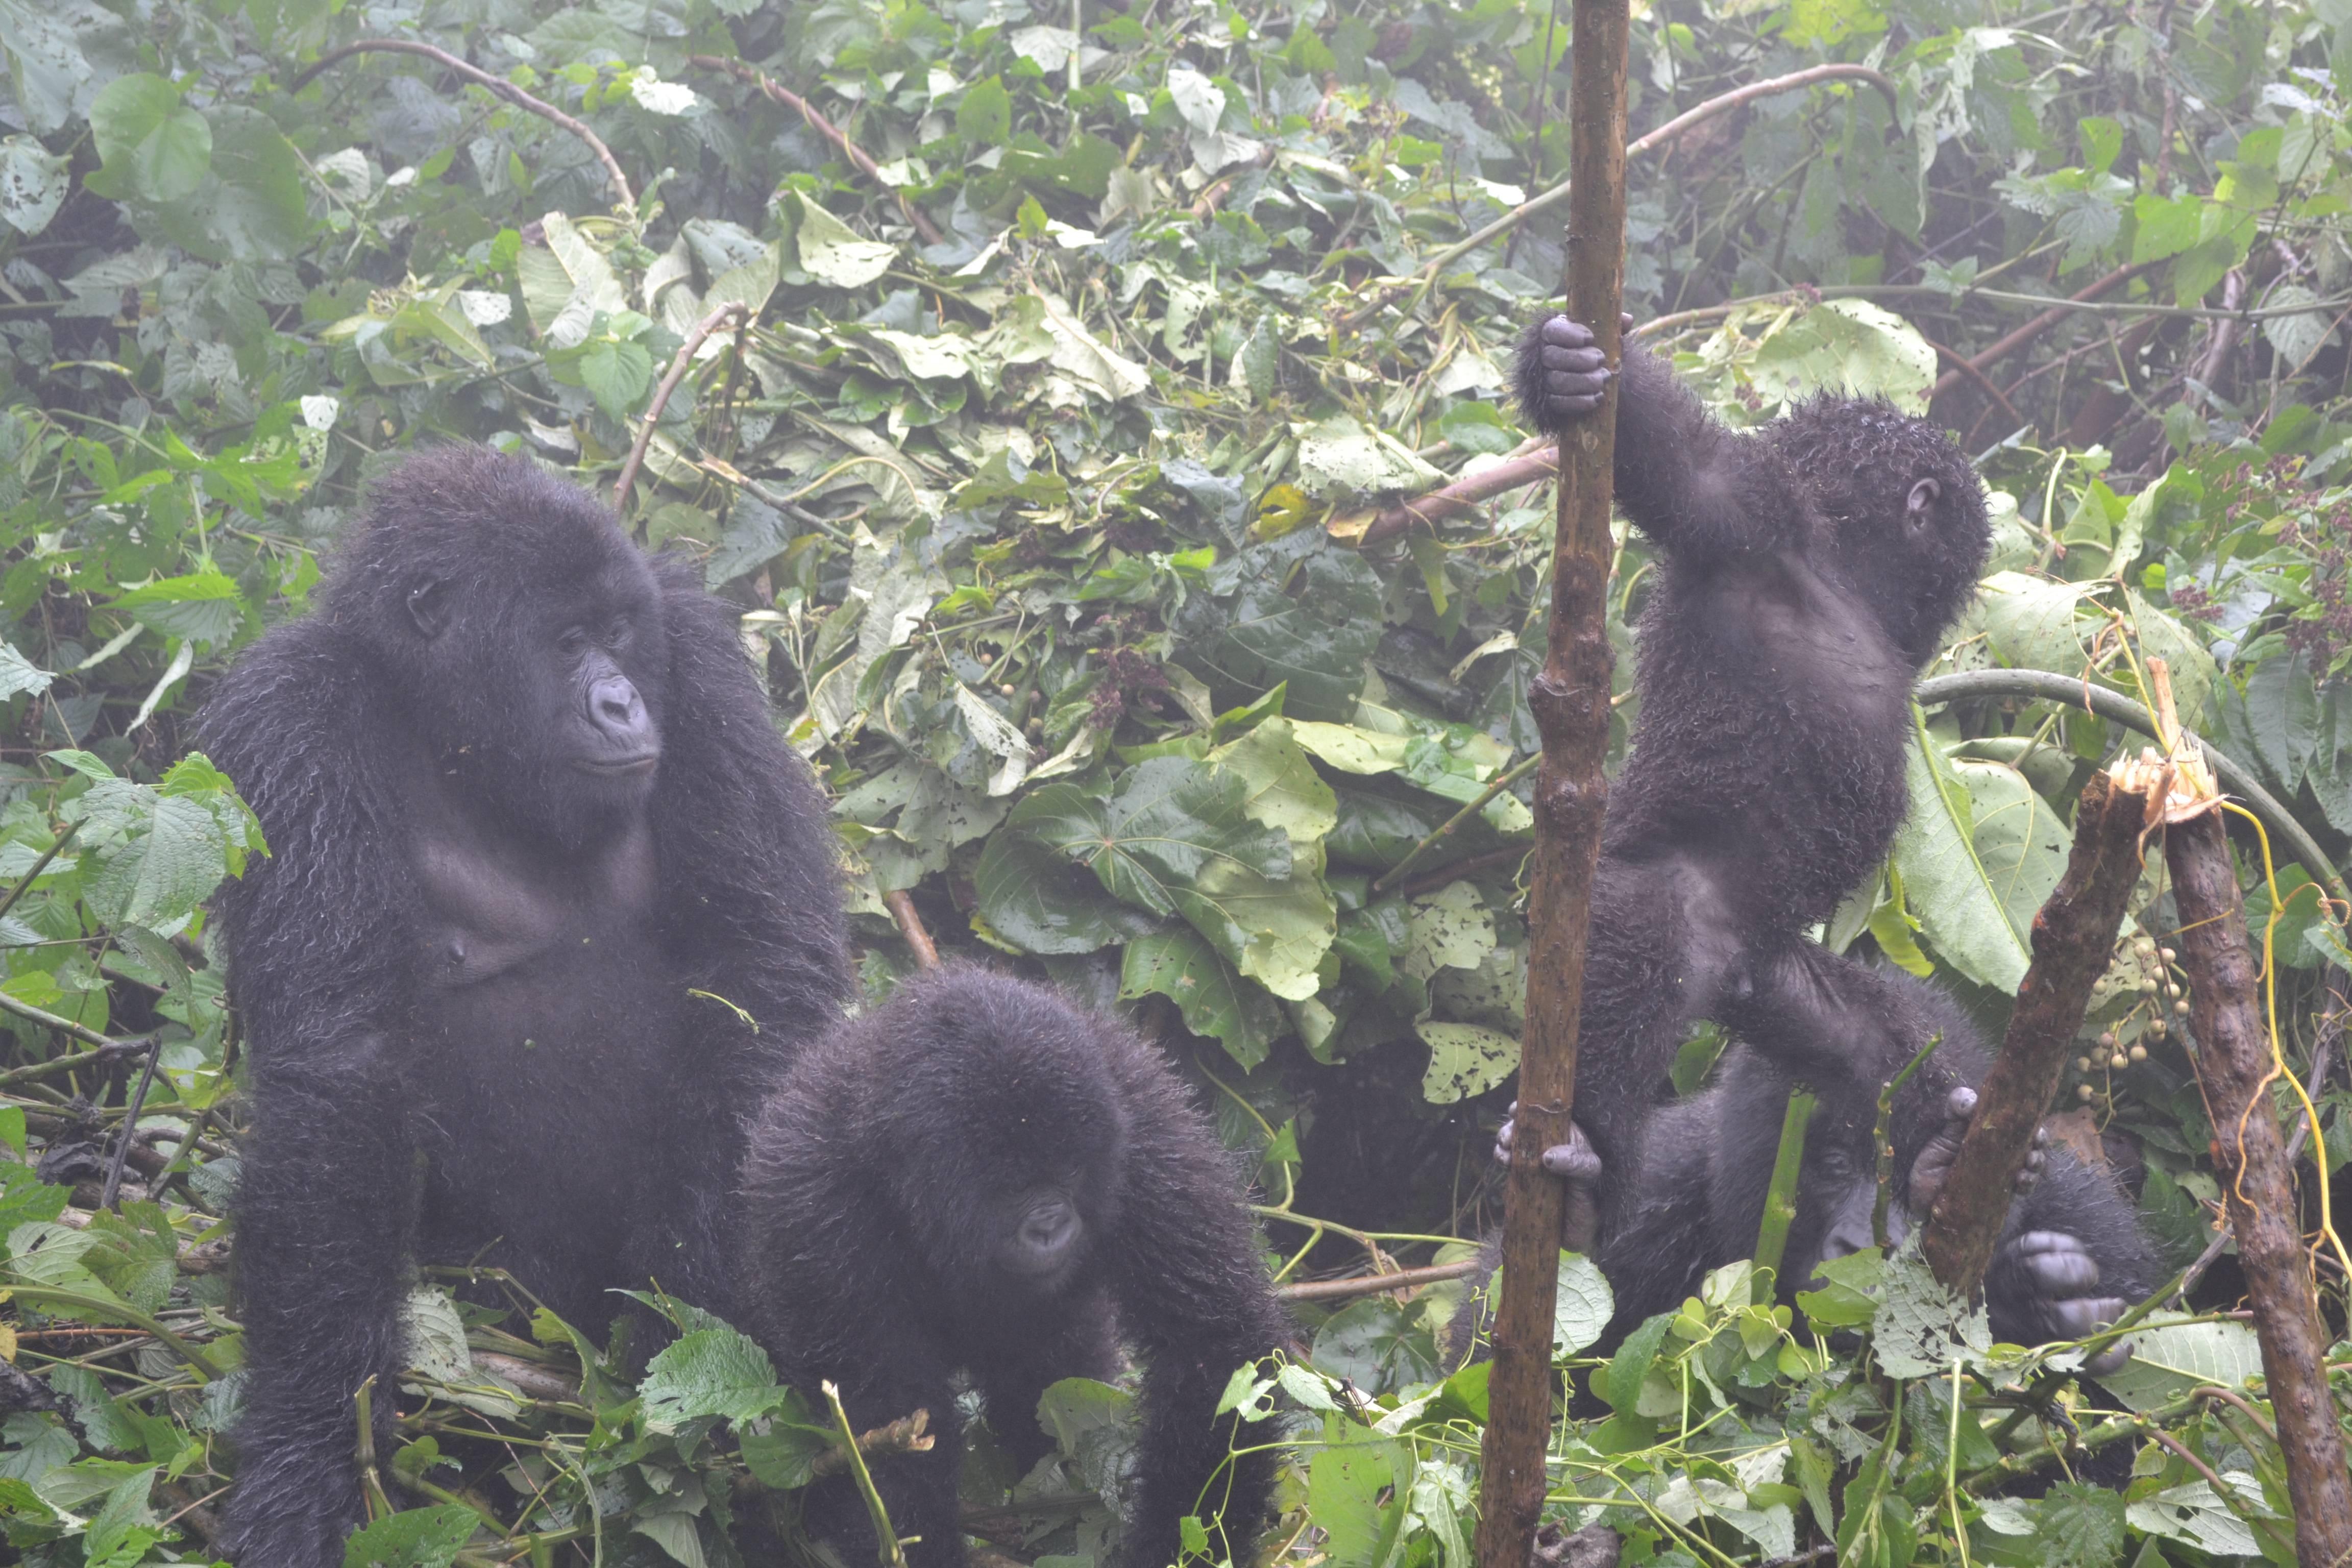 Photo 3: Parc Virunga en RDC